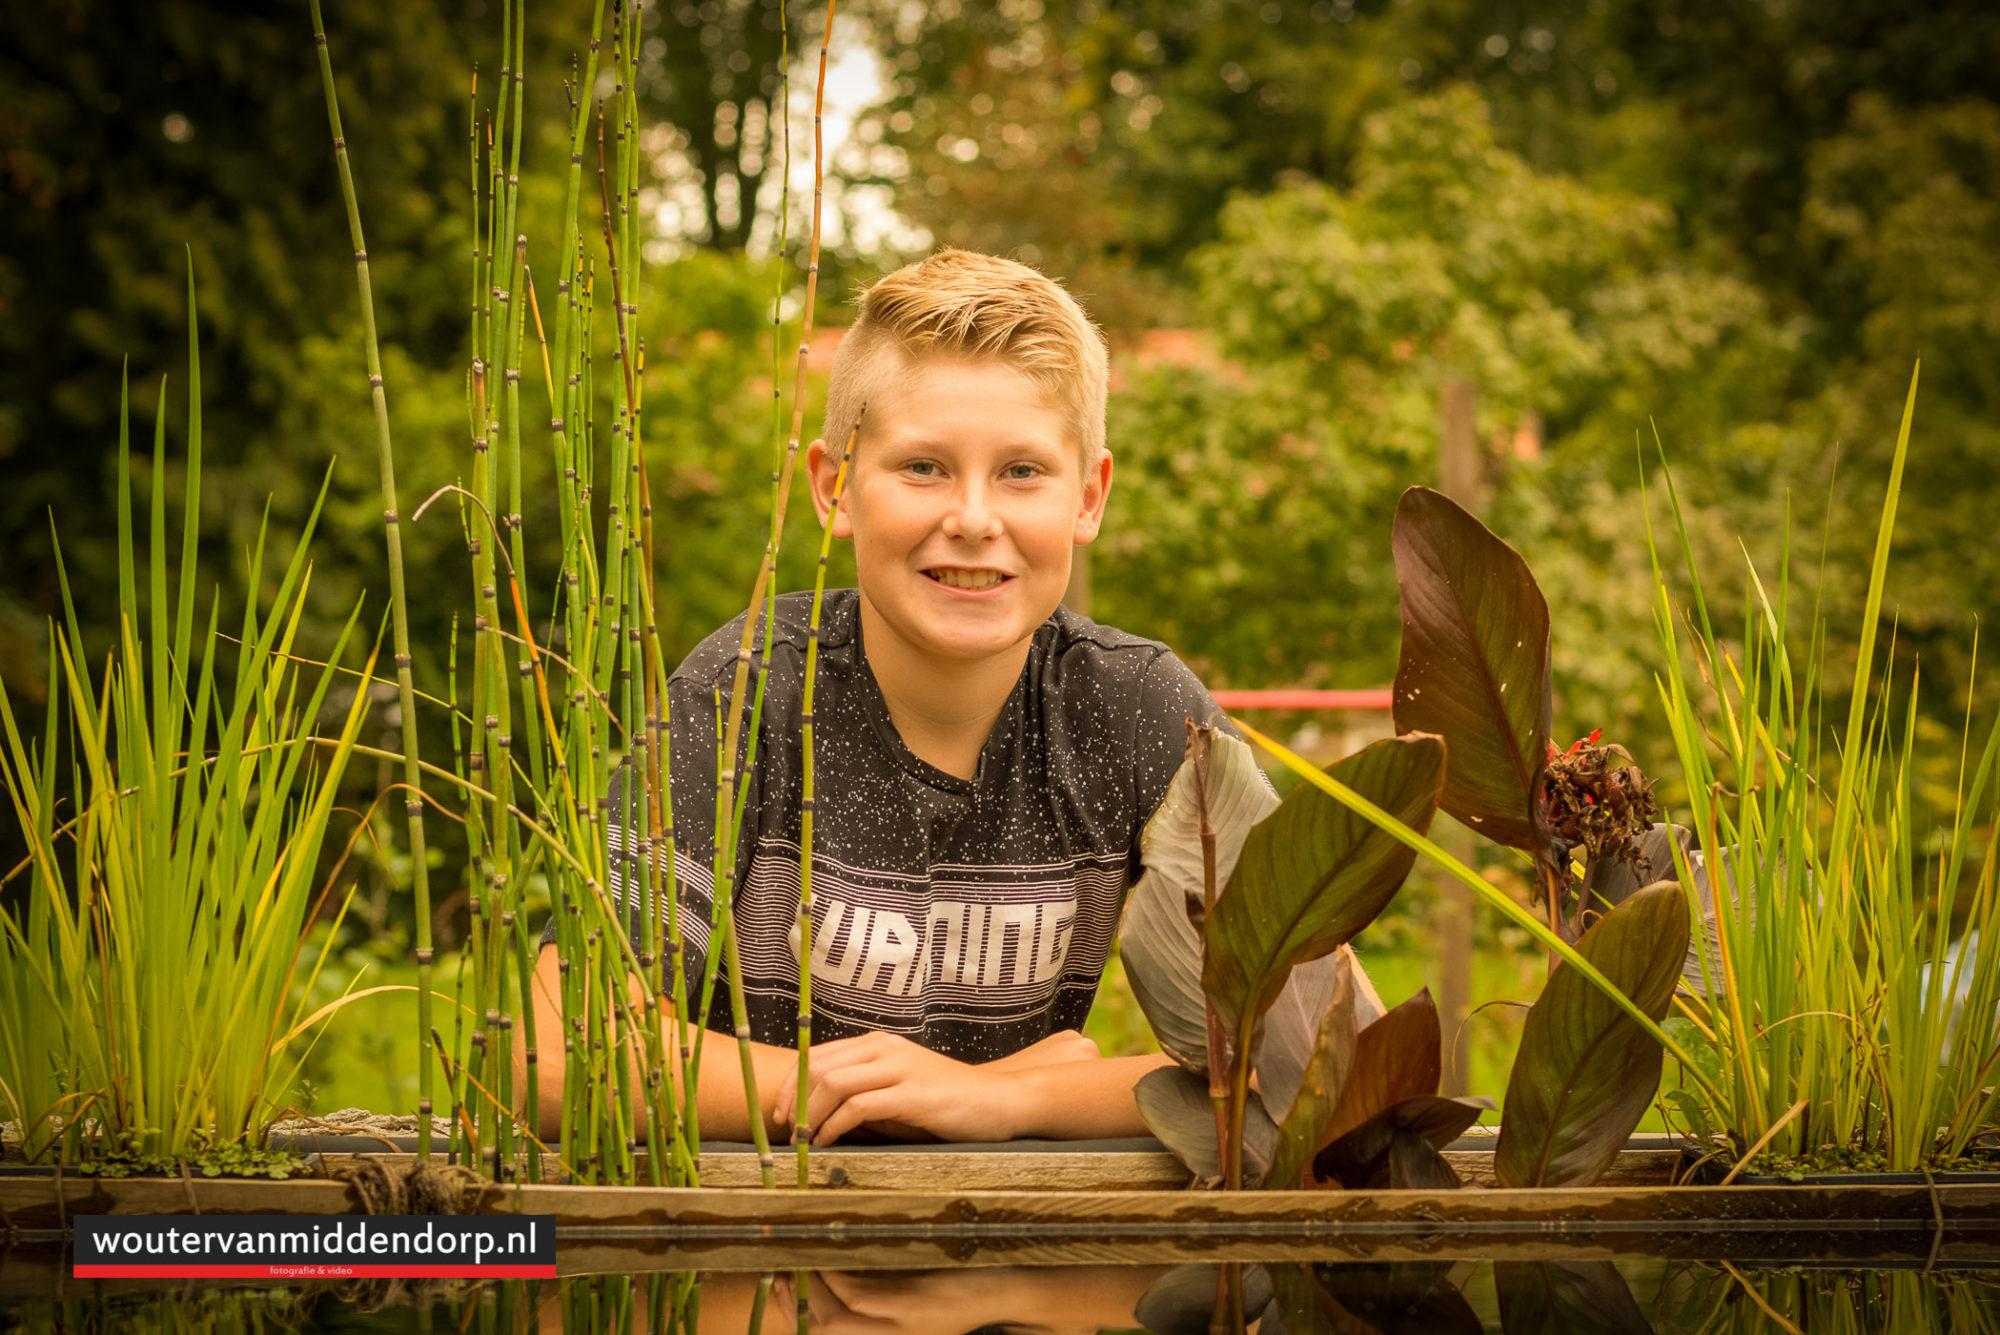 fotograaf Wouter van Middendorp Nunspeet-6